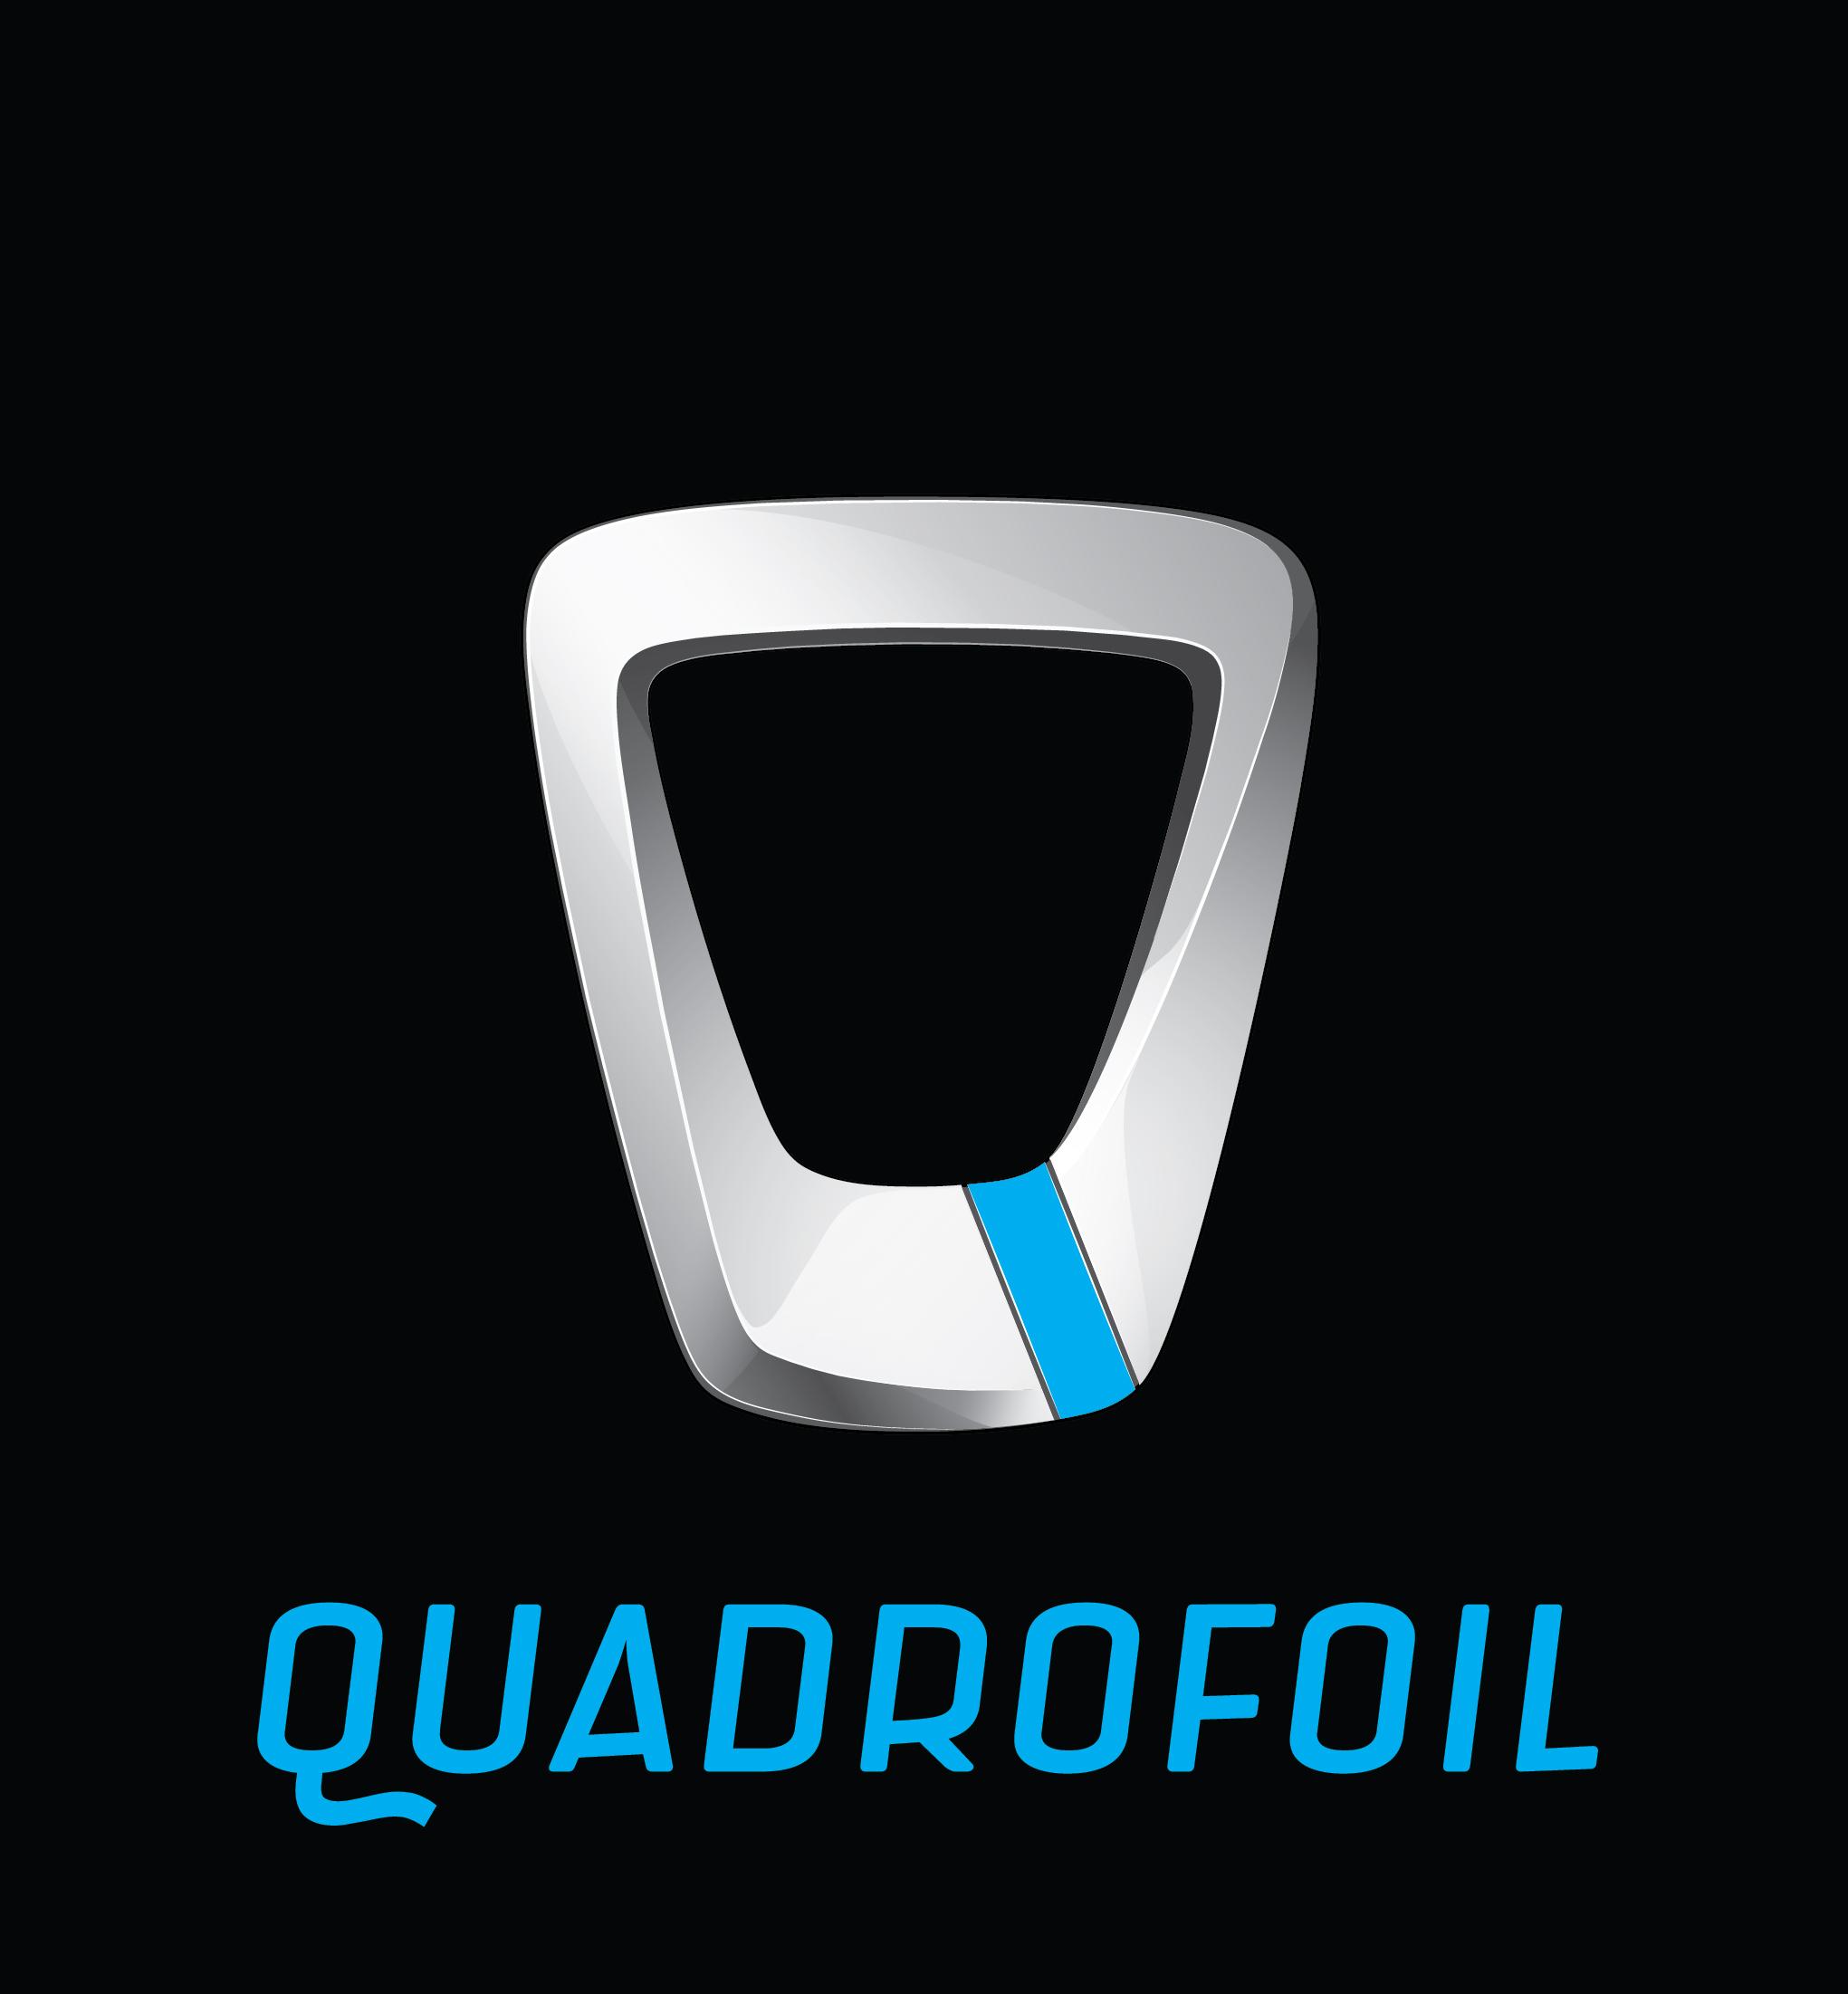 Quadrofoil